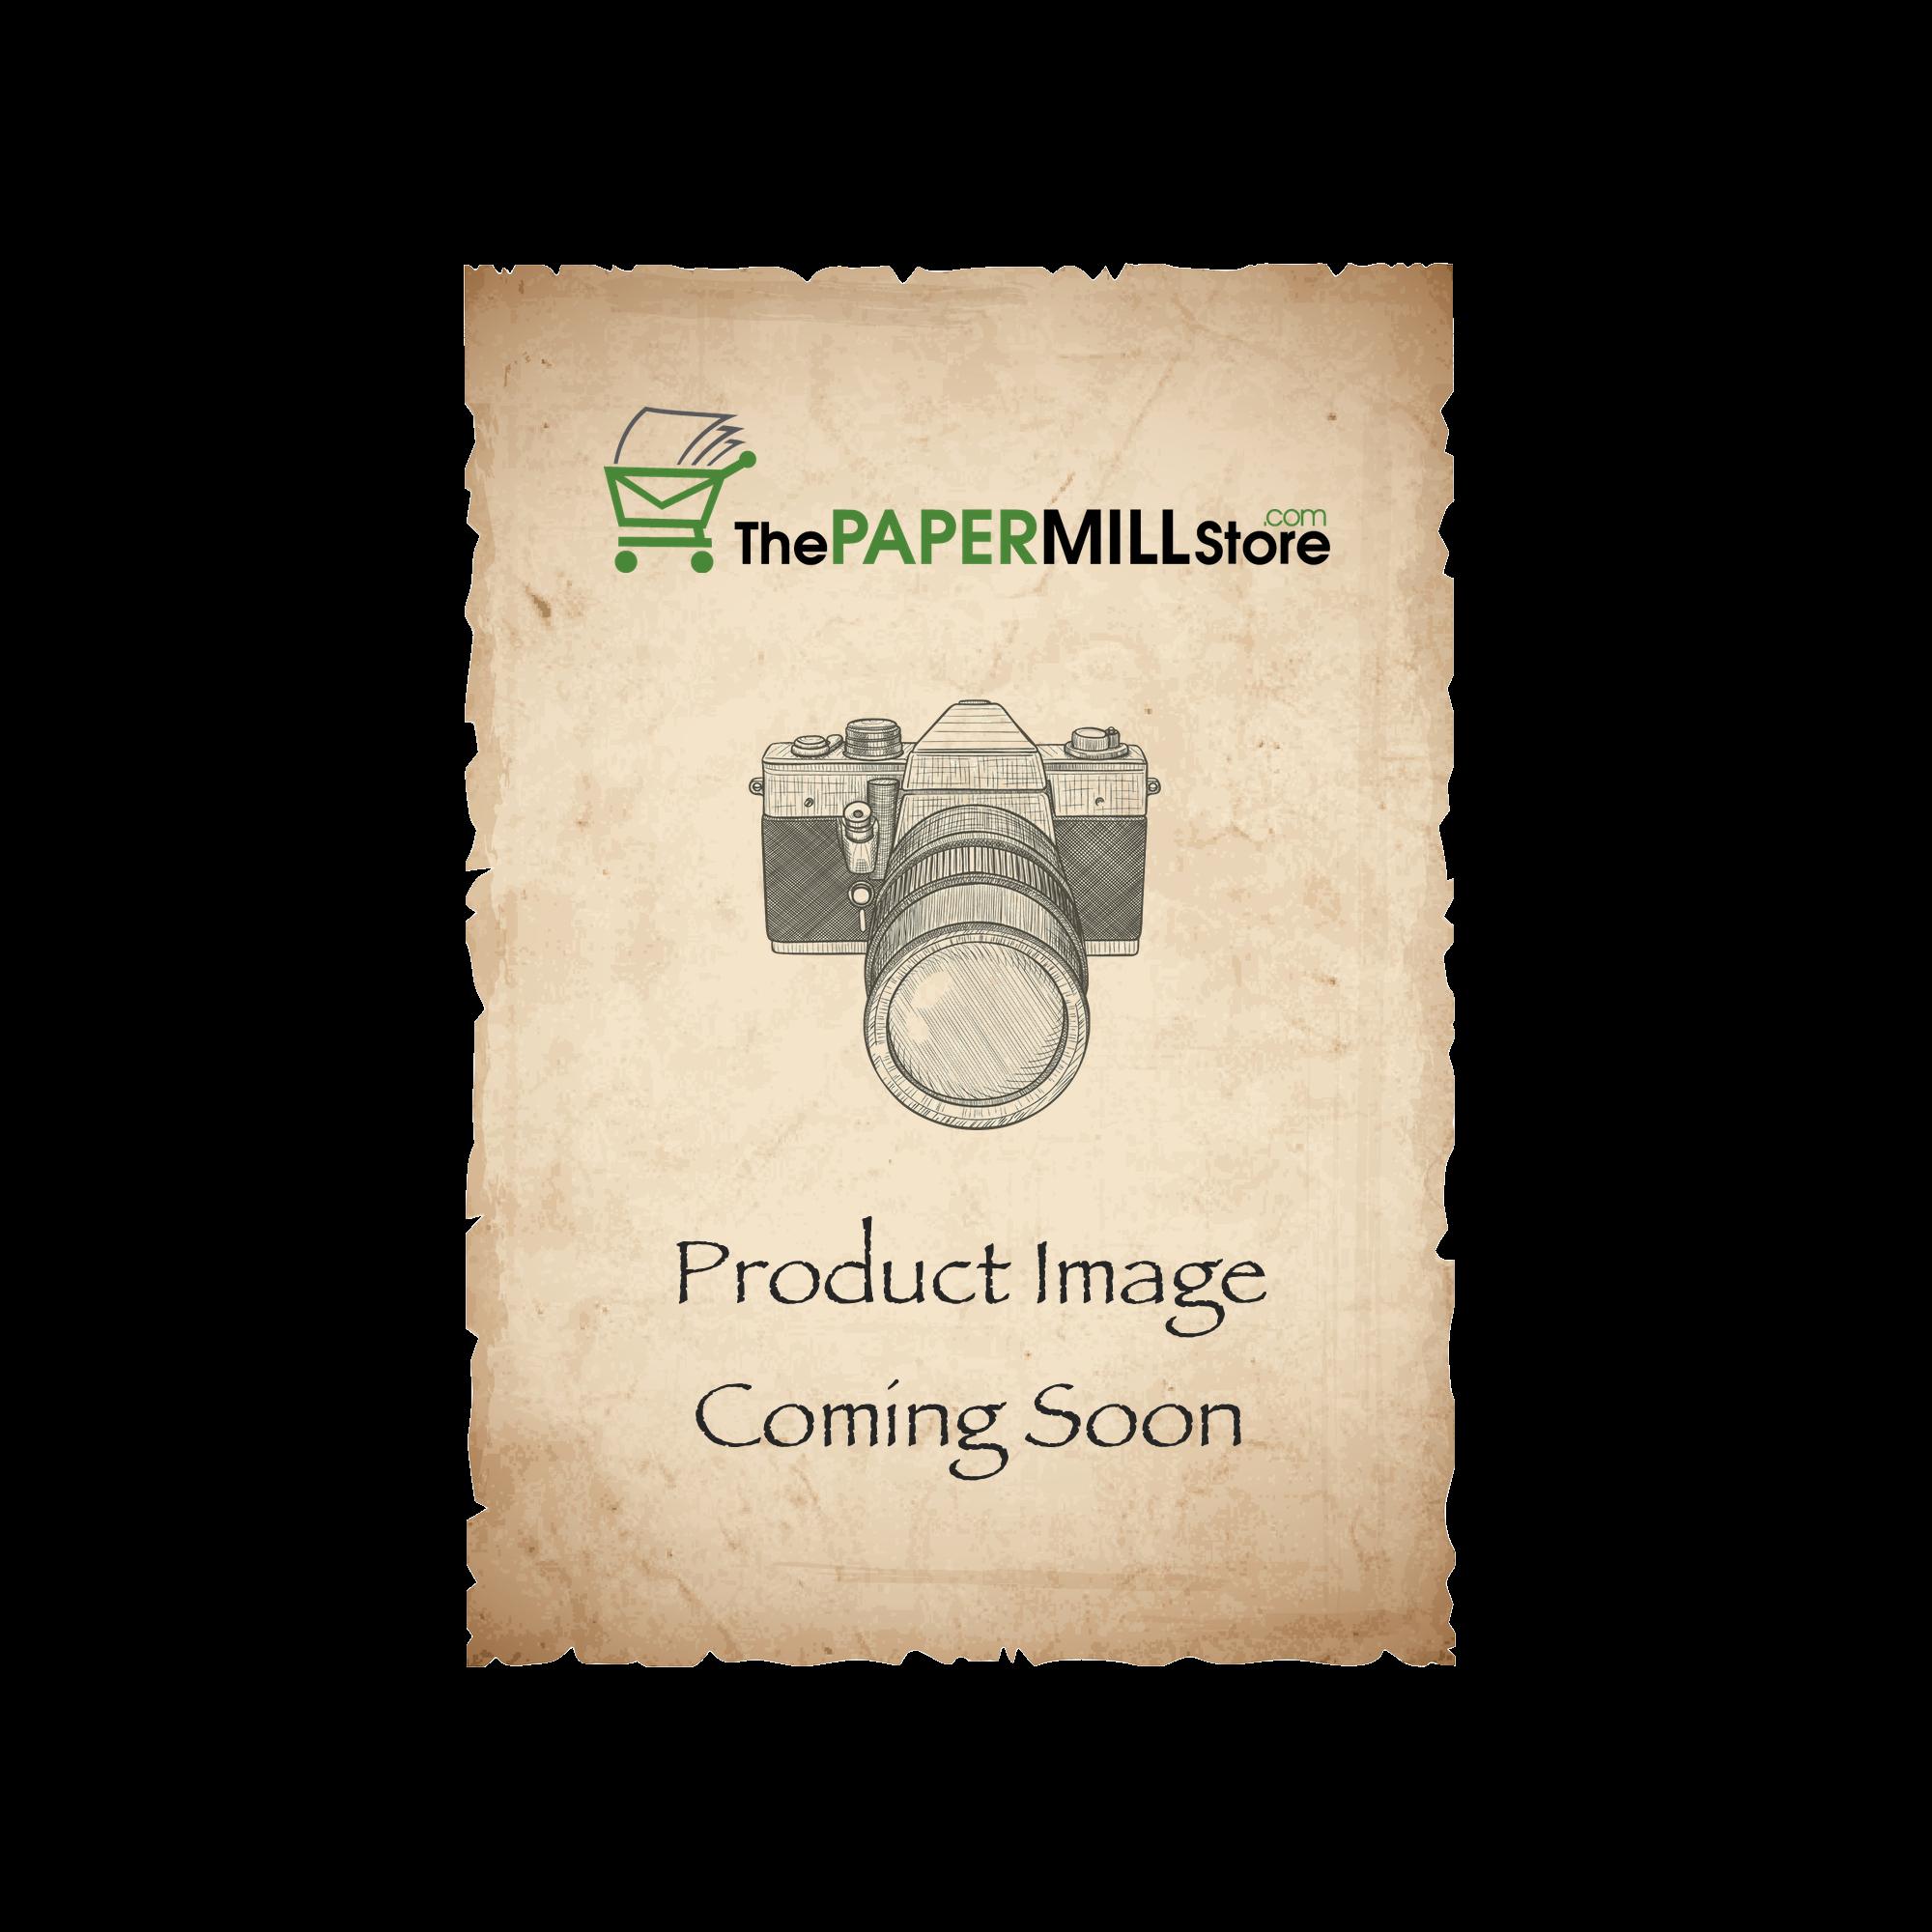 Via Vellum Leaf Green Card Stock - 26 x 40 in 80 lb Cover Vellum  30% Recycled 500 per Carton